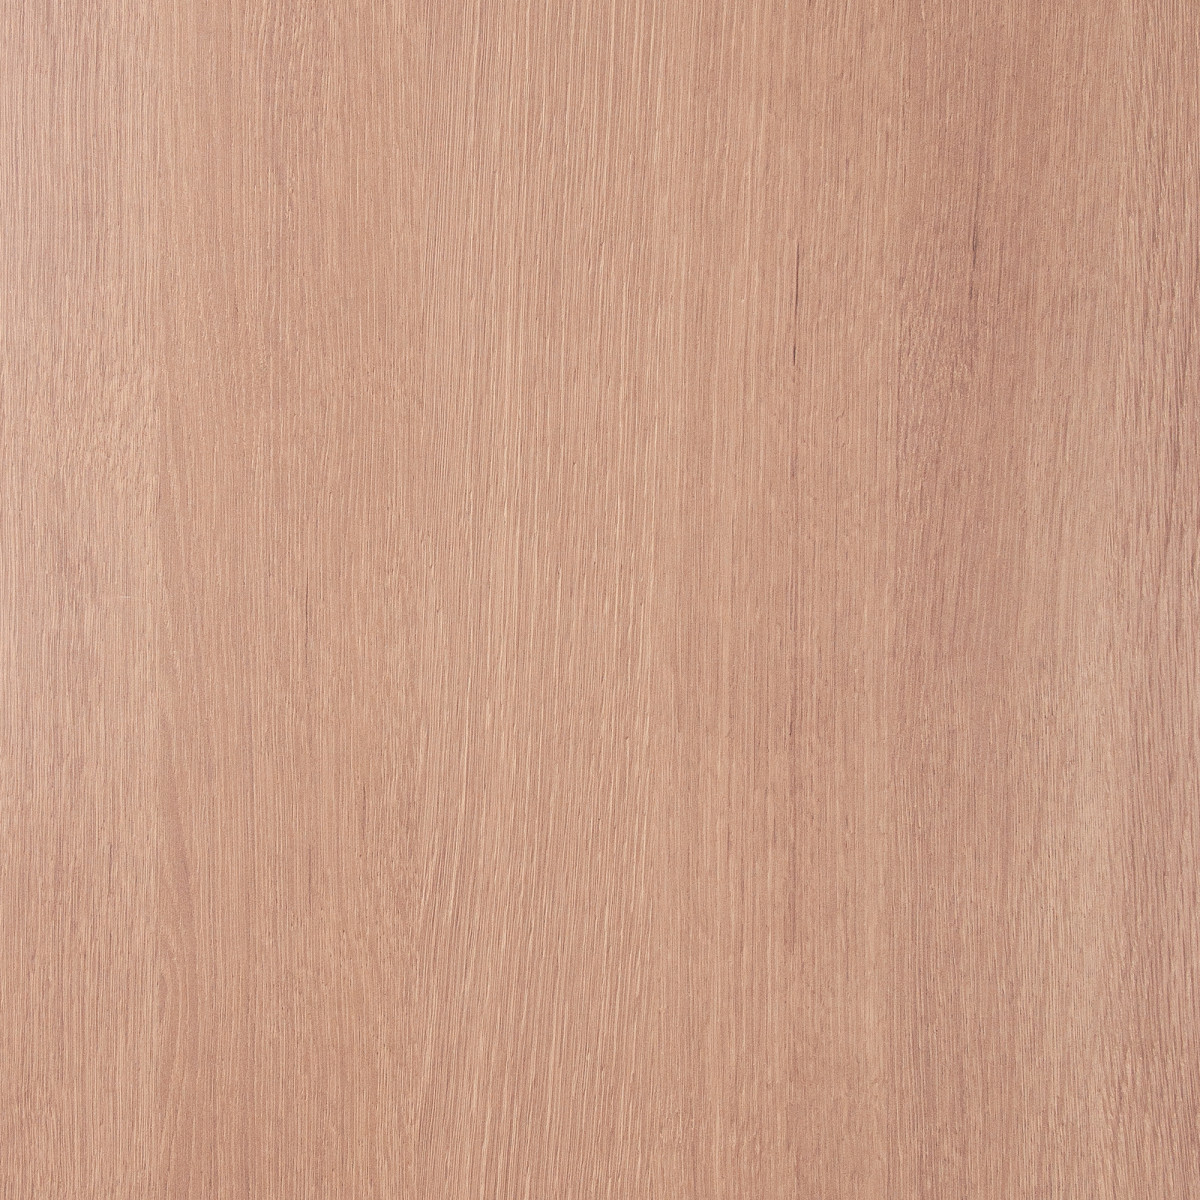 Дверь Межкомнатная Глухая 70x200 Ламинация Цвет Дуб Селект